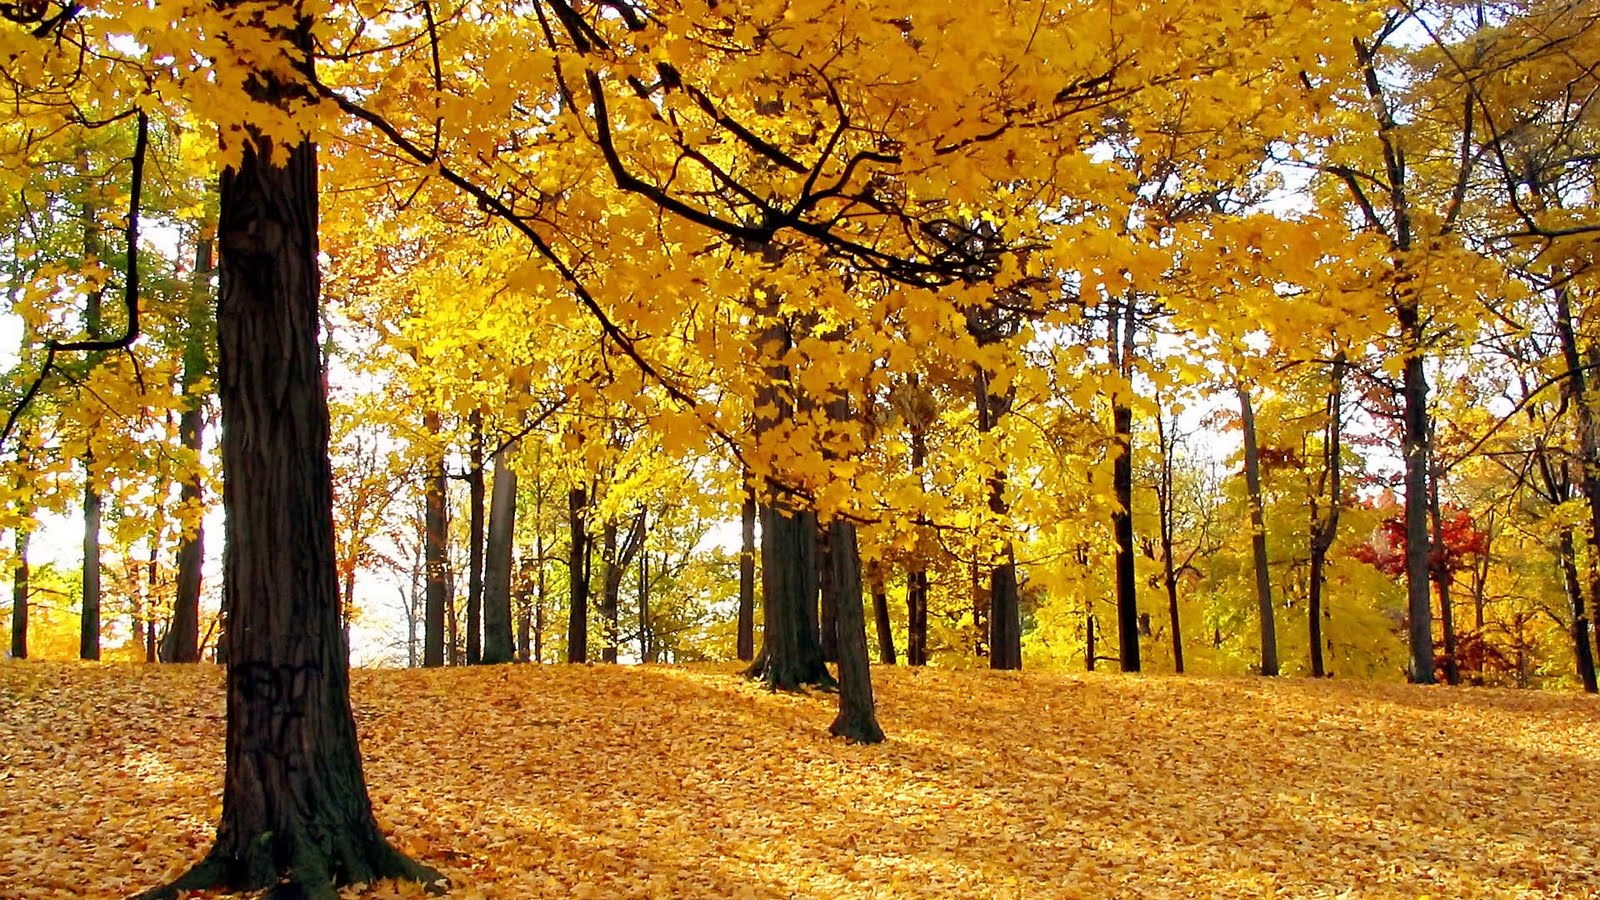 Fall Wallpaper Hd Download Free Wallpapers For Desktop: Life Style Desktop: Autumn Wallpapers HD